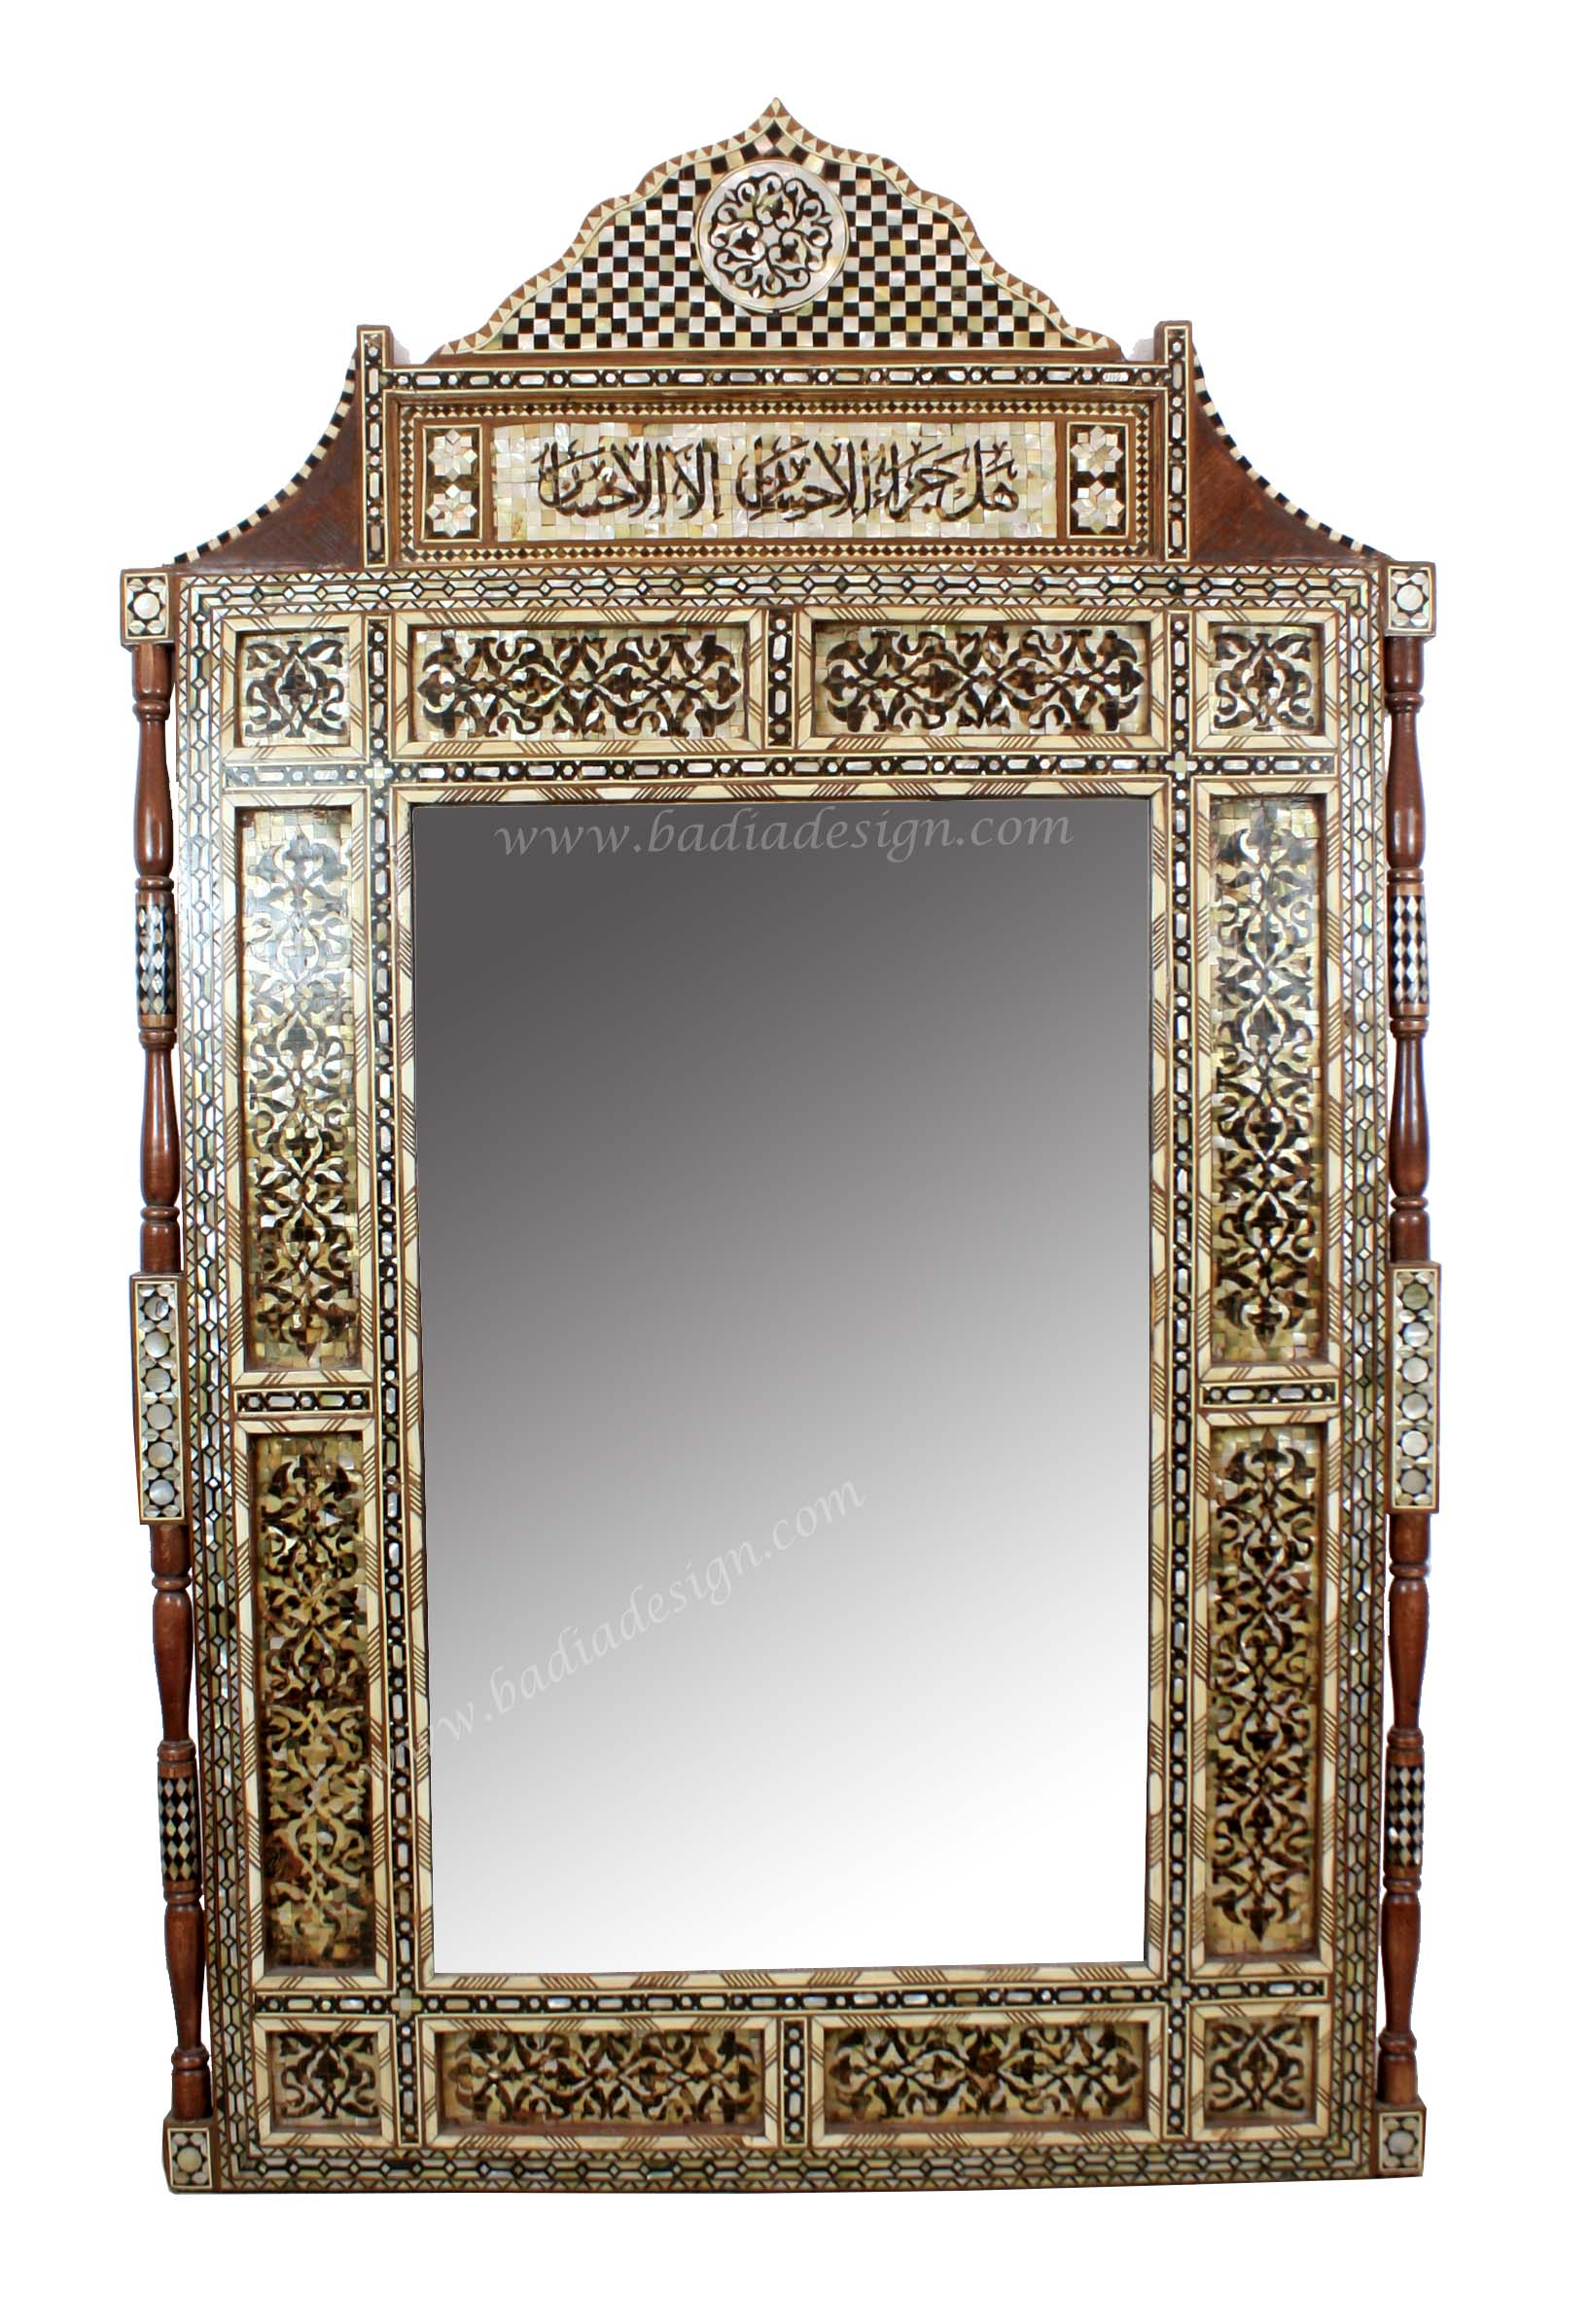 syrian-style-mirror-m-mop032.jpg